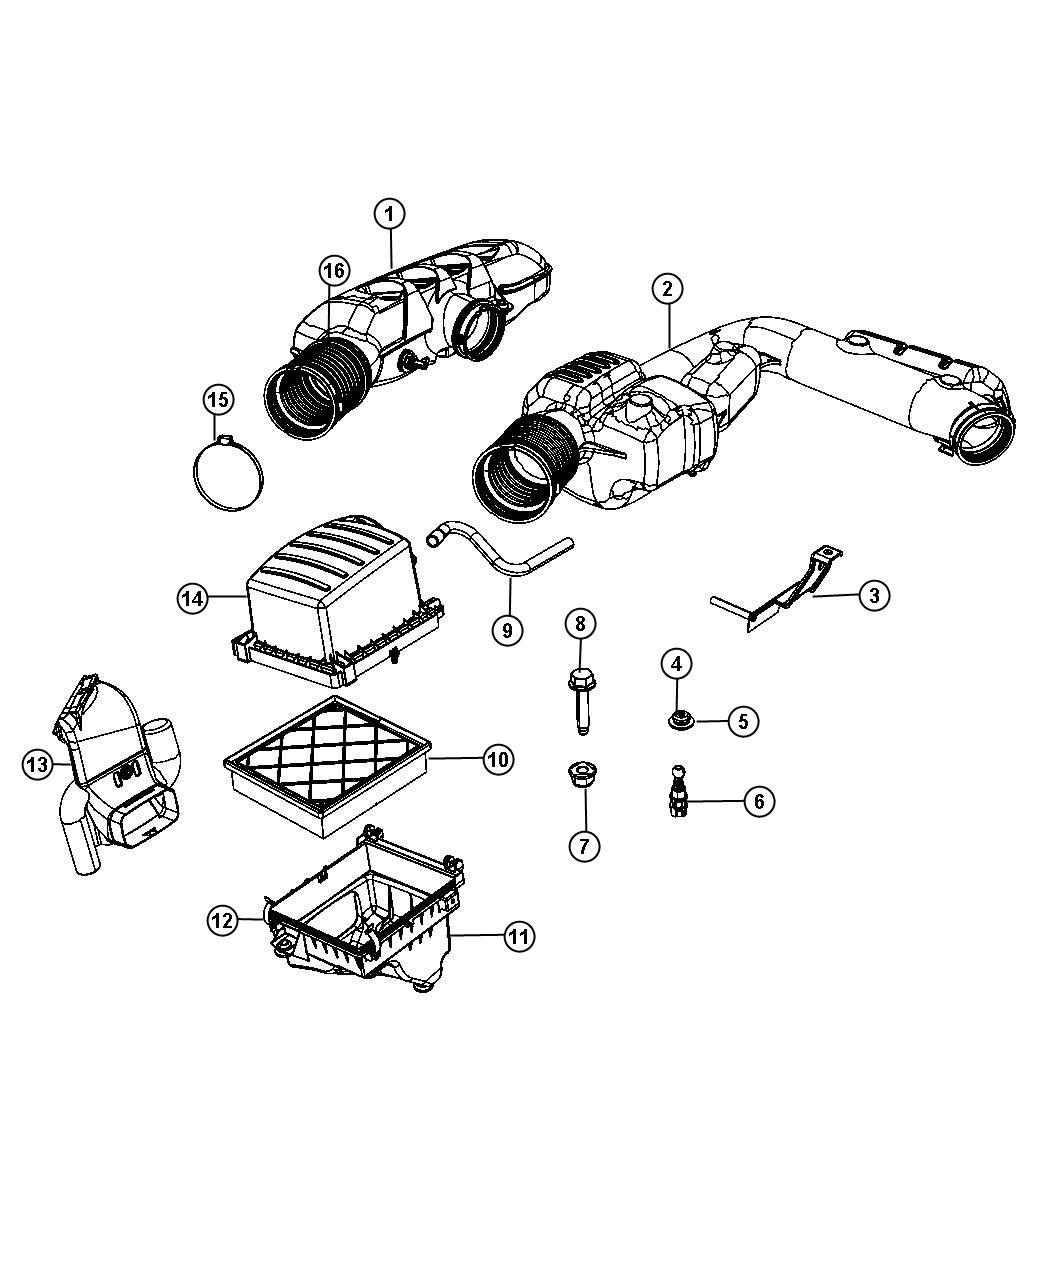 Dodge Magnum Bracket Resonator 3 6l V6 Vvt Engine Air